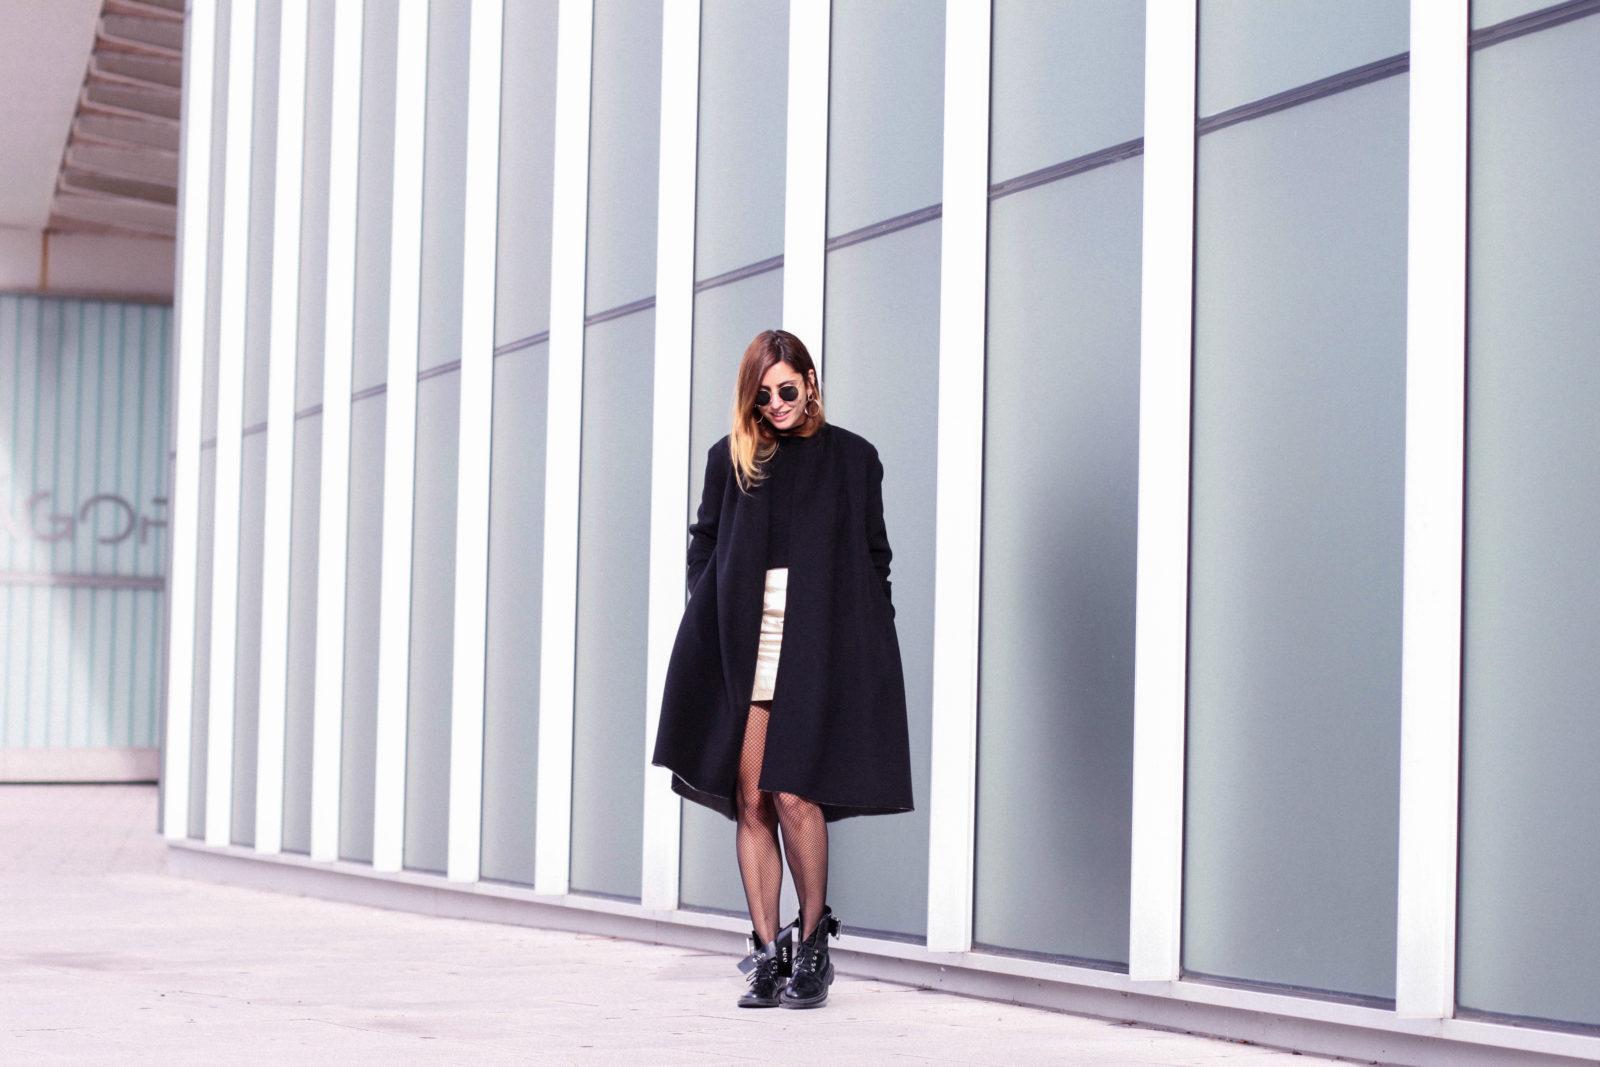 falda_dorada_shein_metalizado_medias_de_rejilla_choker_donkeycool_street_style_trends_2016-16